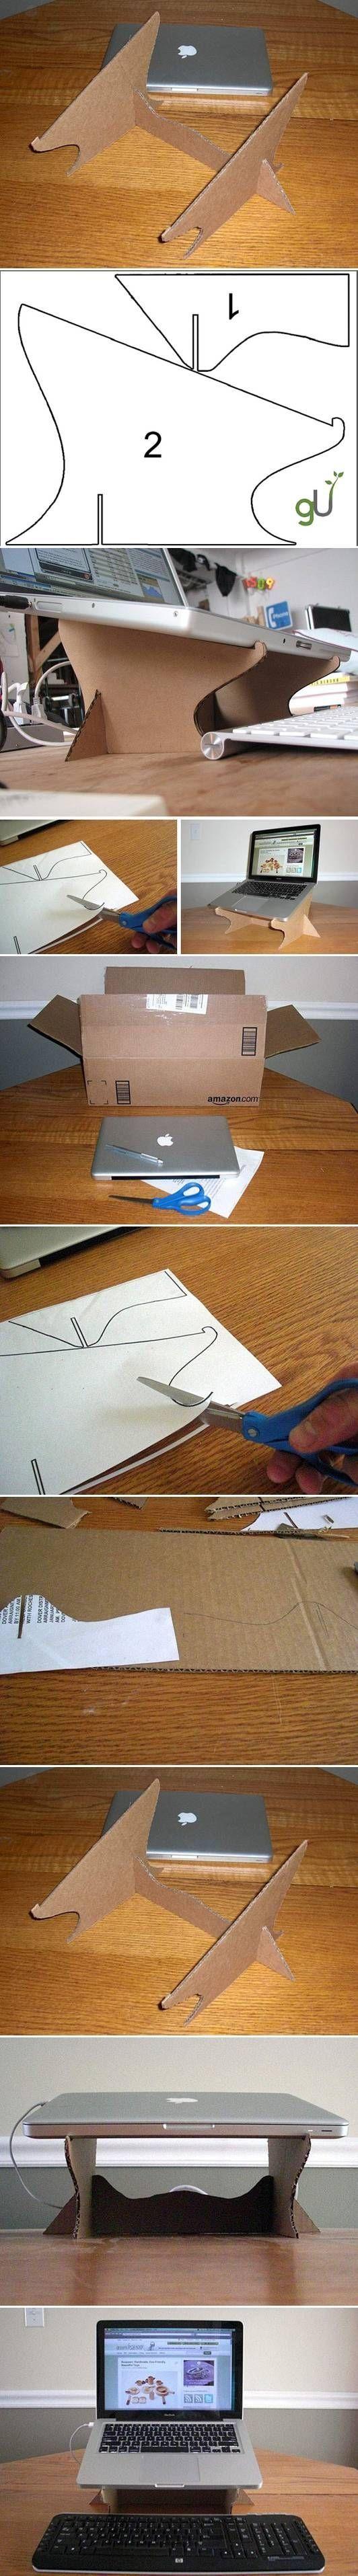 Simple Cardboard #Laptop #Stand